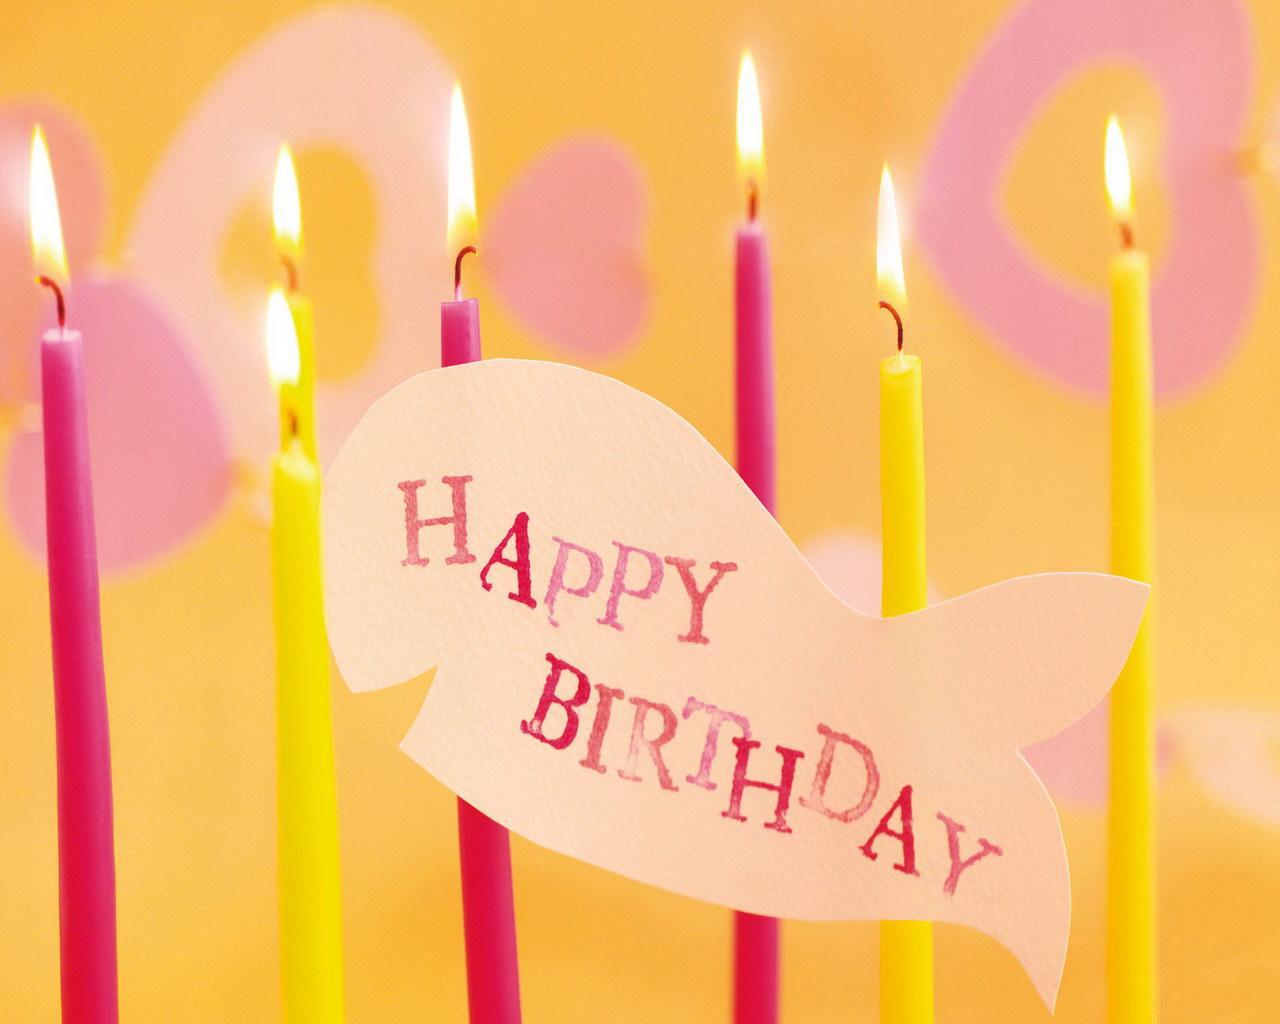 birthday wallpaper Size 1280X1024 1280x1024